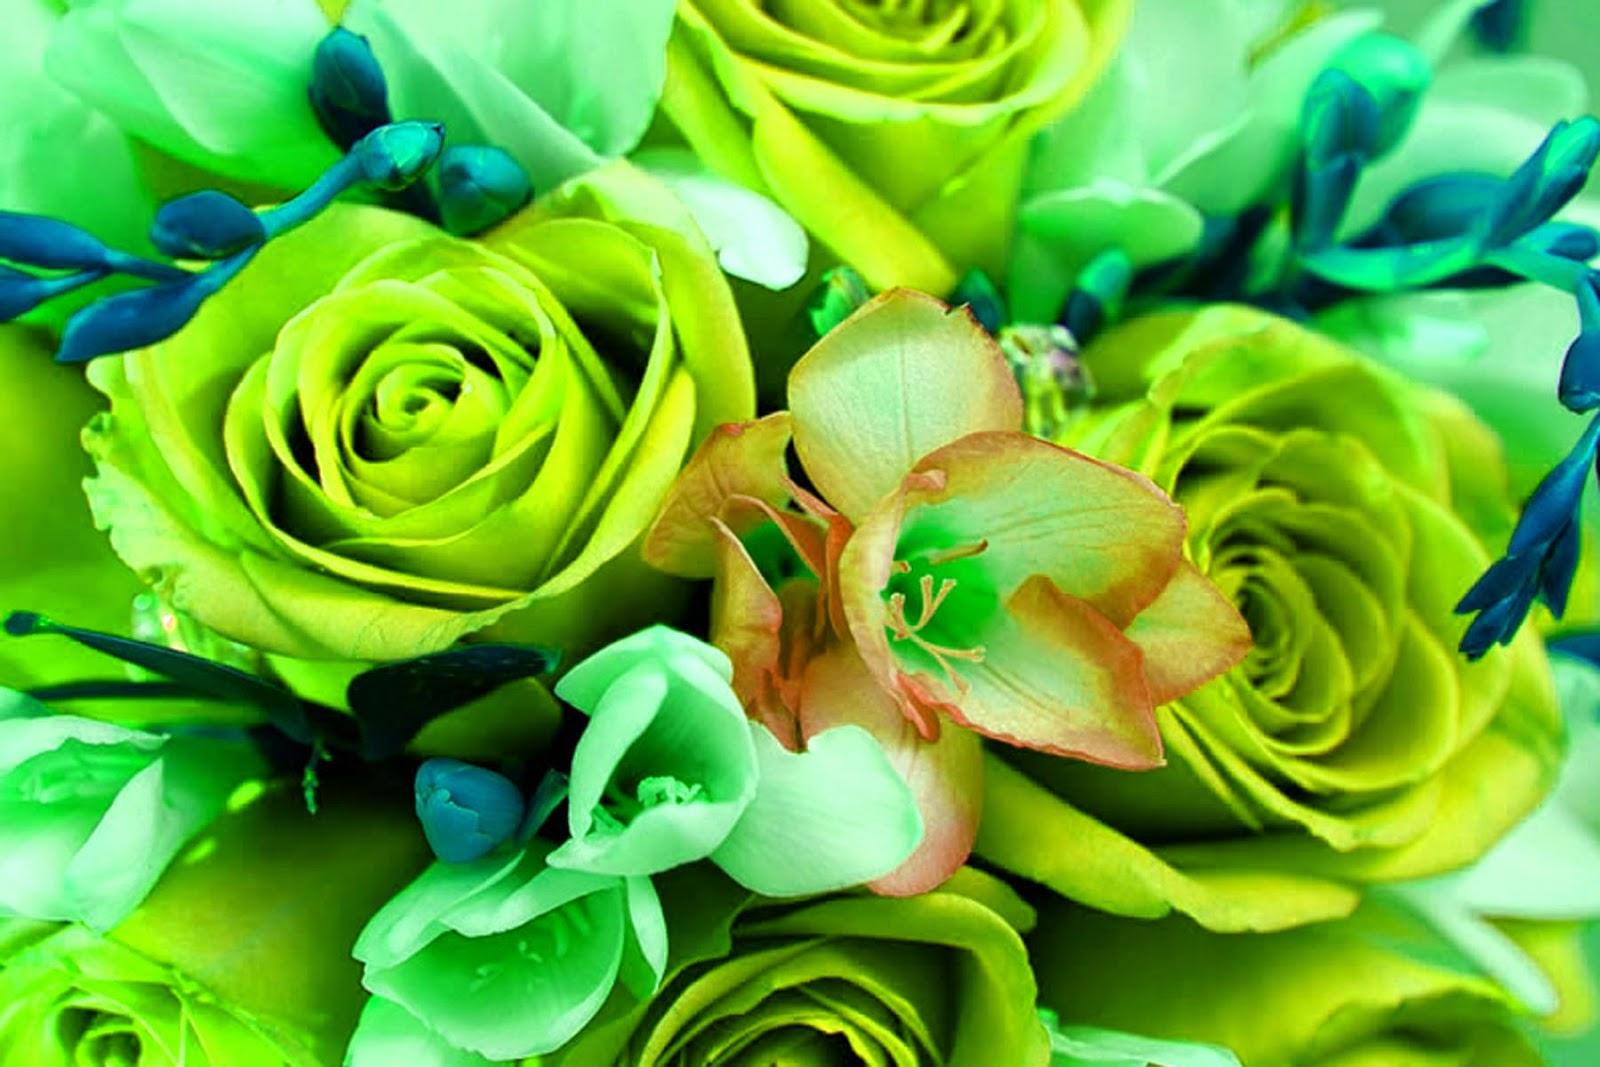 http://3.bp.blogspot.com/-Vqg6mX8mQAY/VJ37PROeQBI/AAAAAAAA0kw/l-0tlX7hUkw/s1600/flowers%2Blime%2Band%2Bteal%2Byellow.jpg